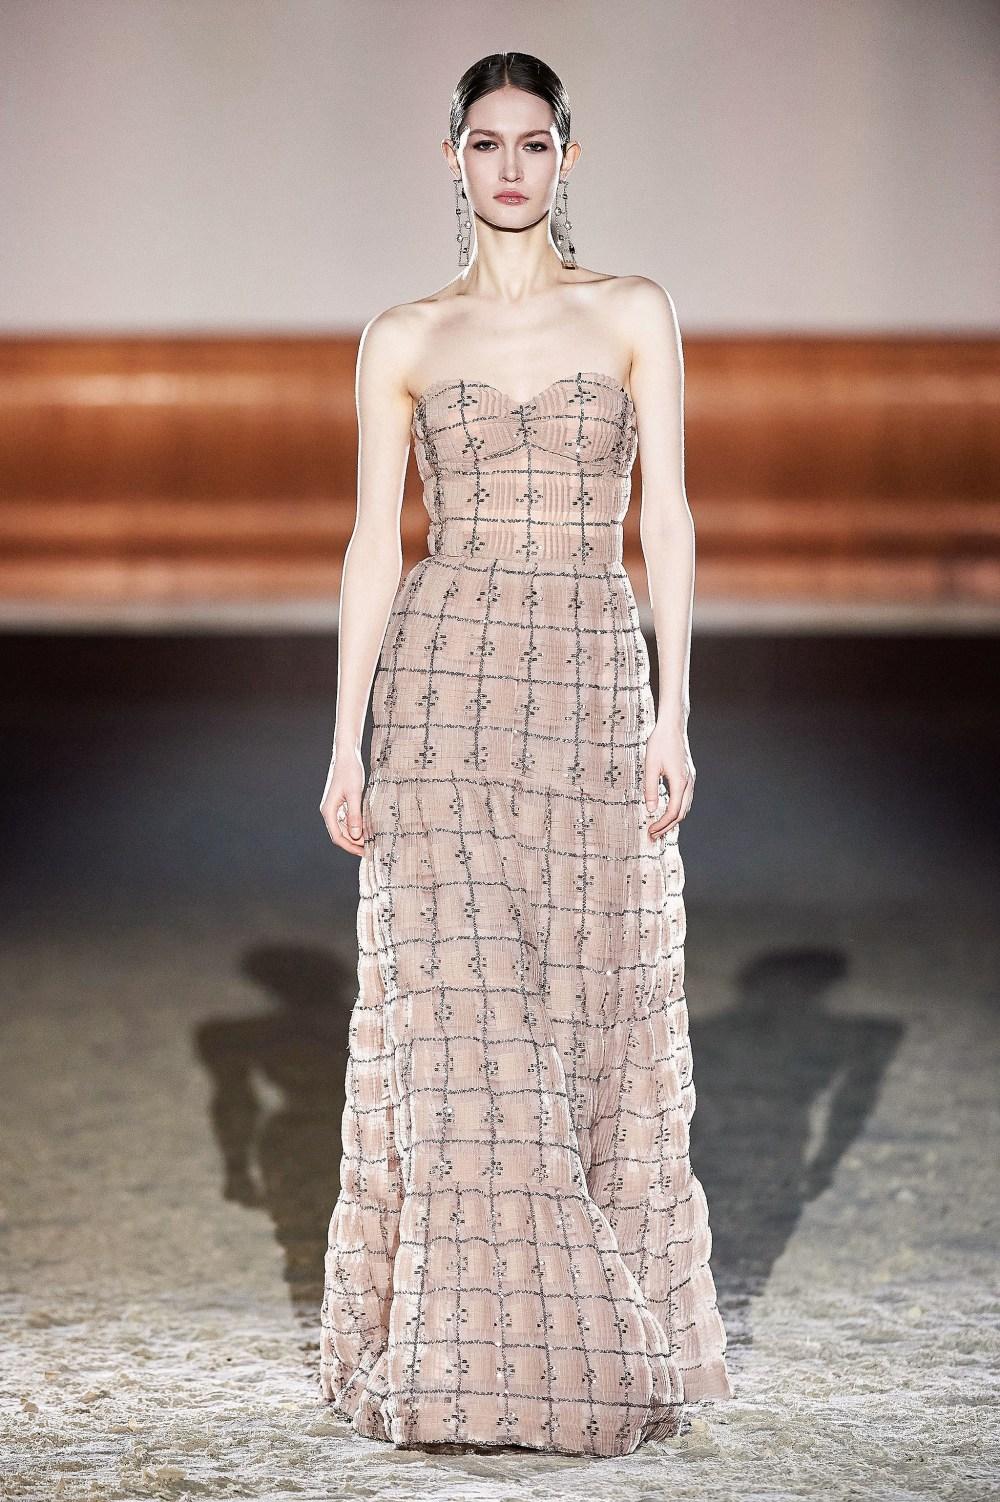 Elisabetta Franchi: Elisabetta Franchi Fall Winter 2021-22 Fashion Show Photo #35